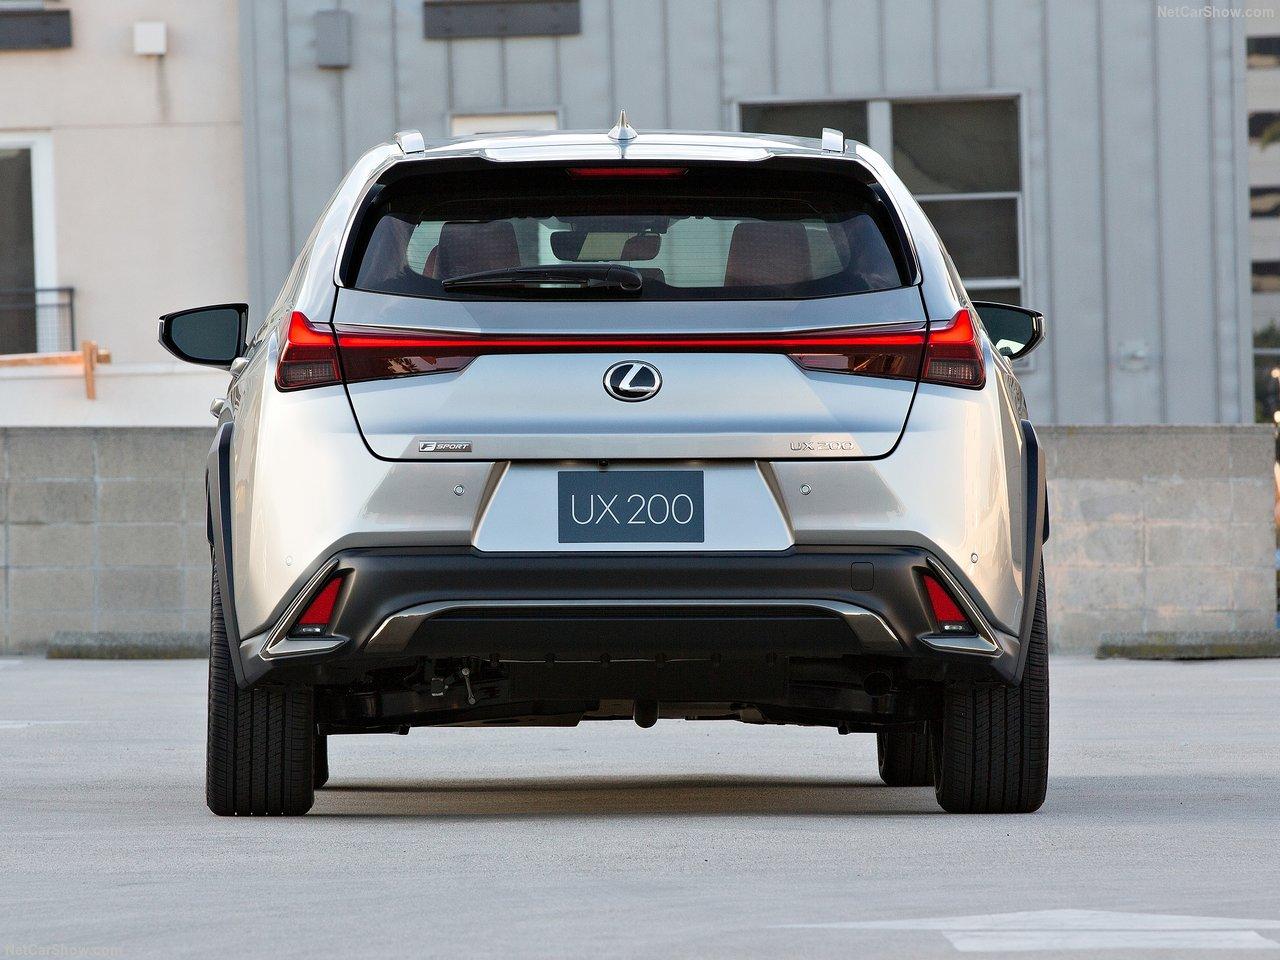 Lexus-UX-2019-1280-17_20181001185608ccd.jpg